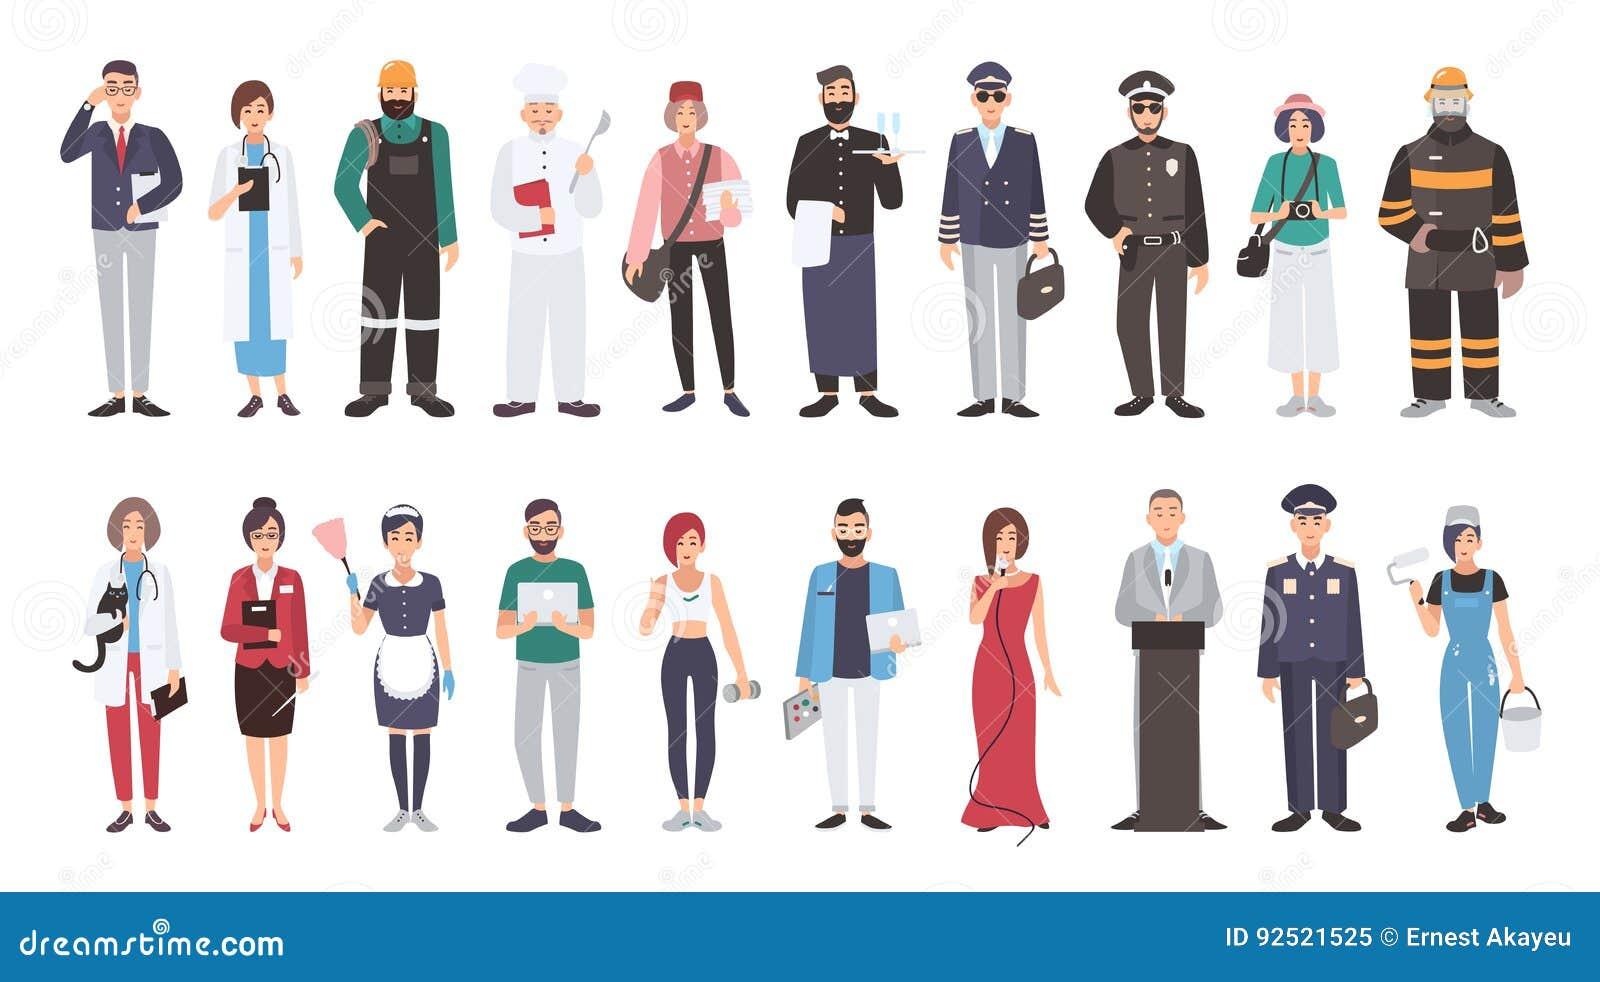 Set of different people profession. flat illustration. Manager, doctor, builder, cook, postman, waiter, pilot, policeman